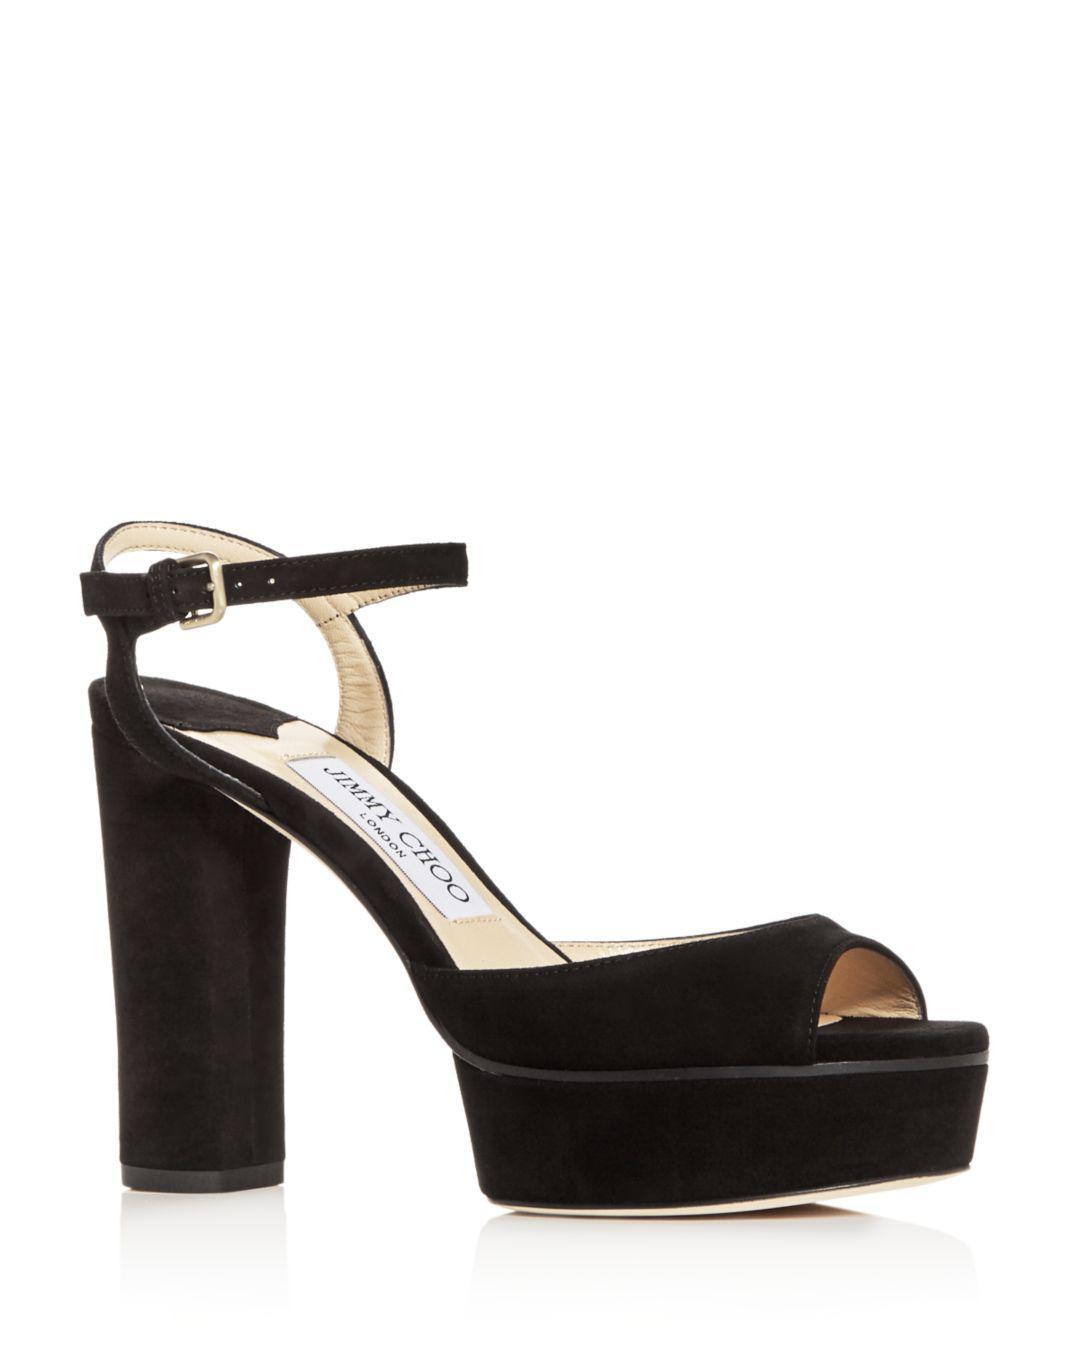 60c29af4542 Jimmy Choo Women s Peachy 105 High-heel Platform Sandals in Black - Lyst